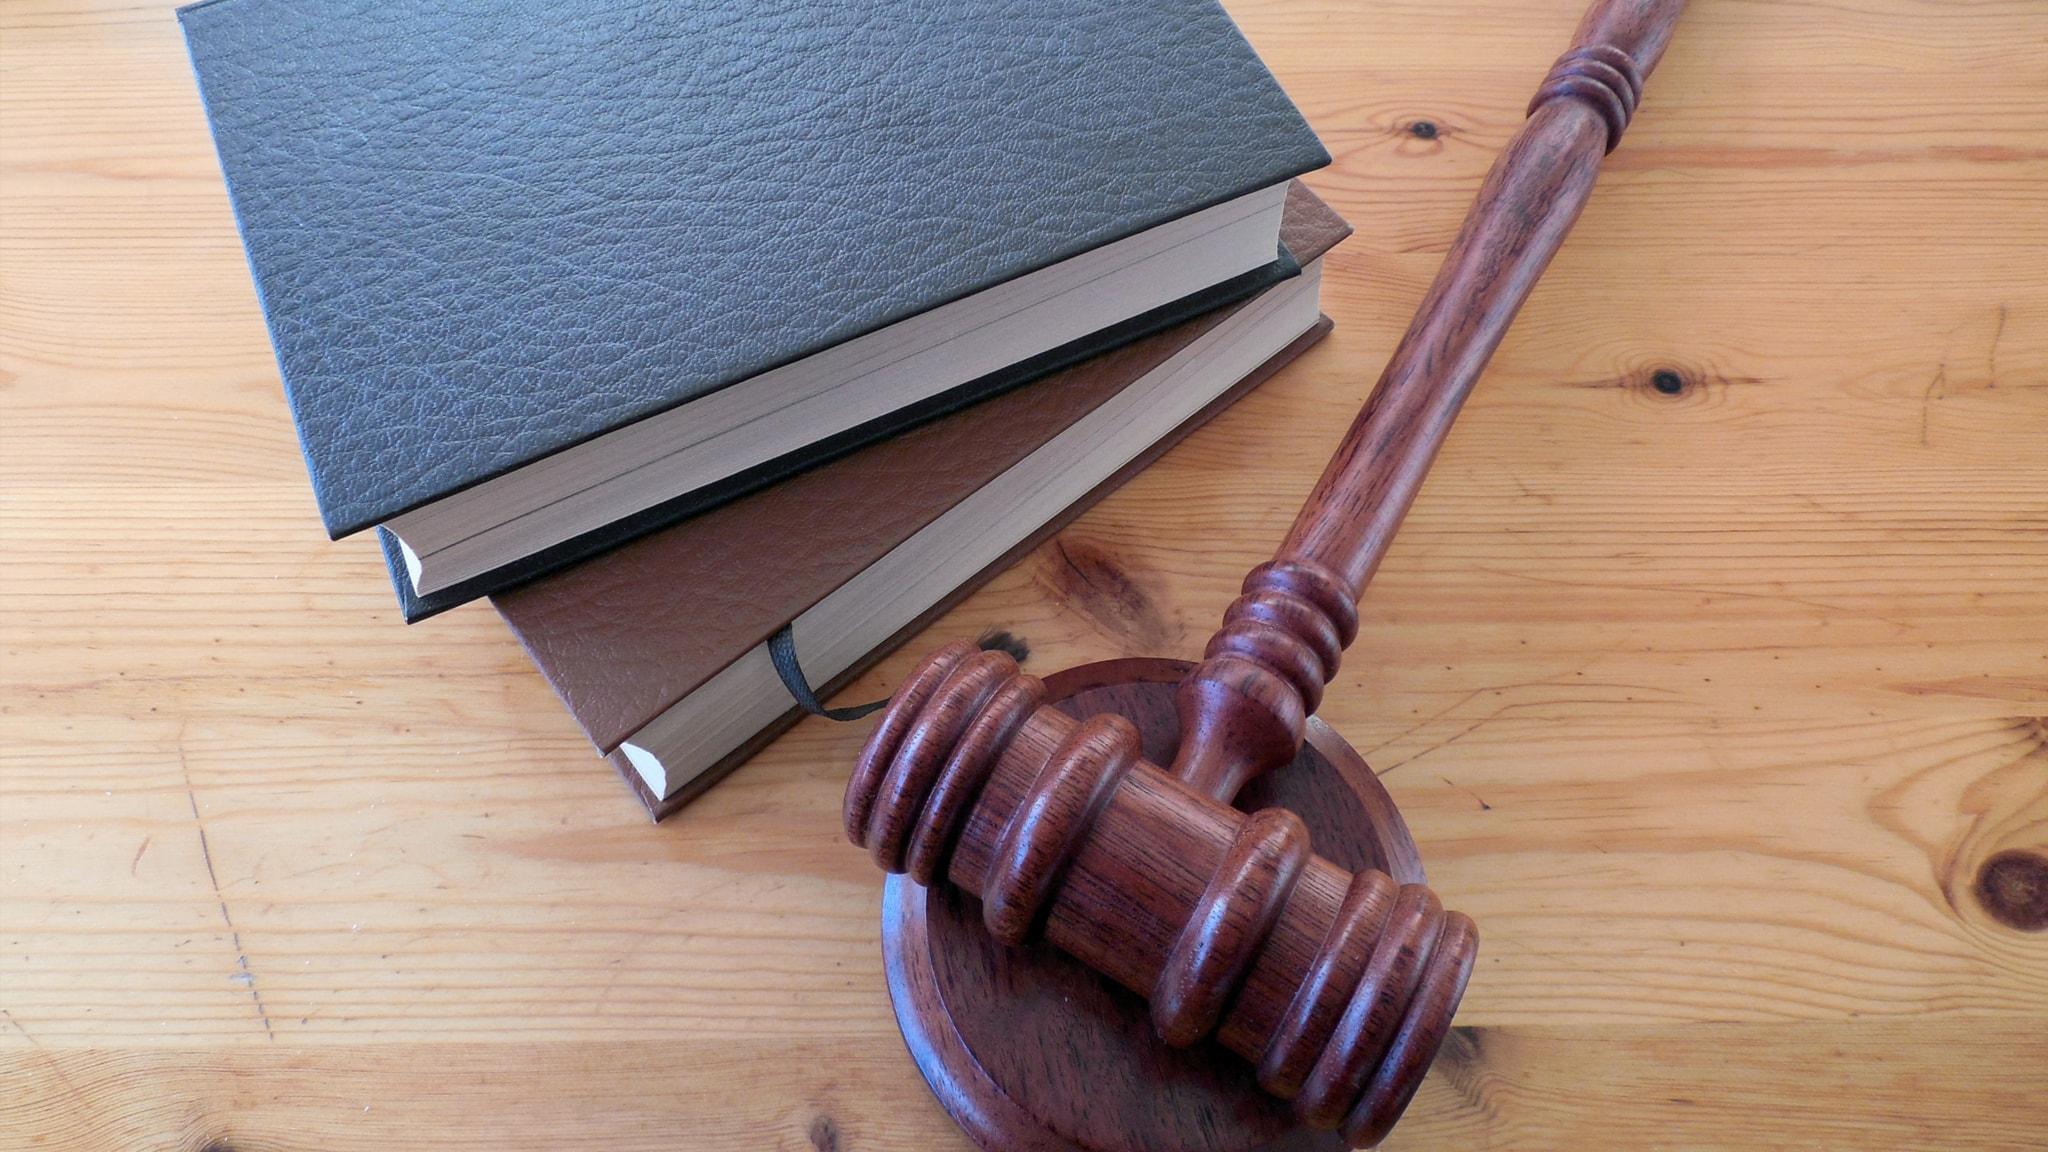 Idrottsledare doms for sexbrott mot 18 barn